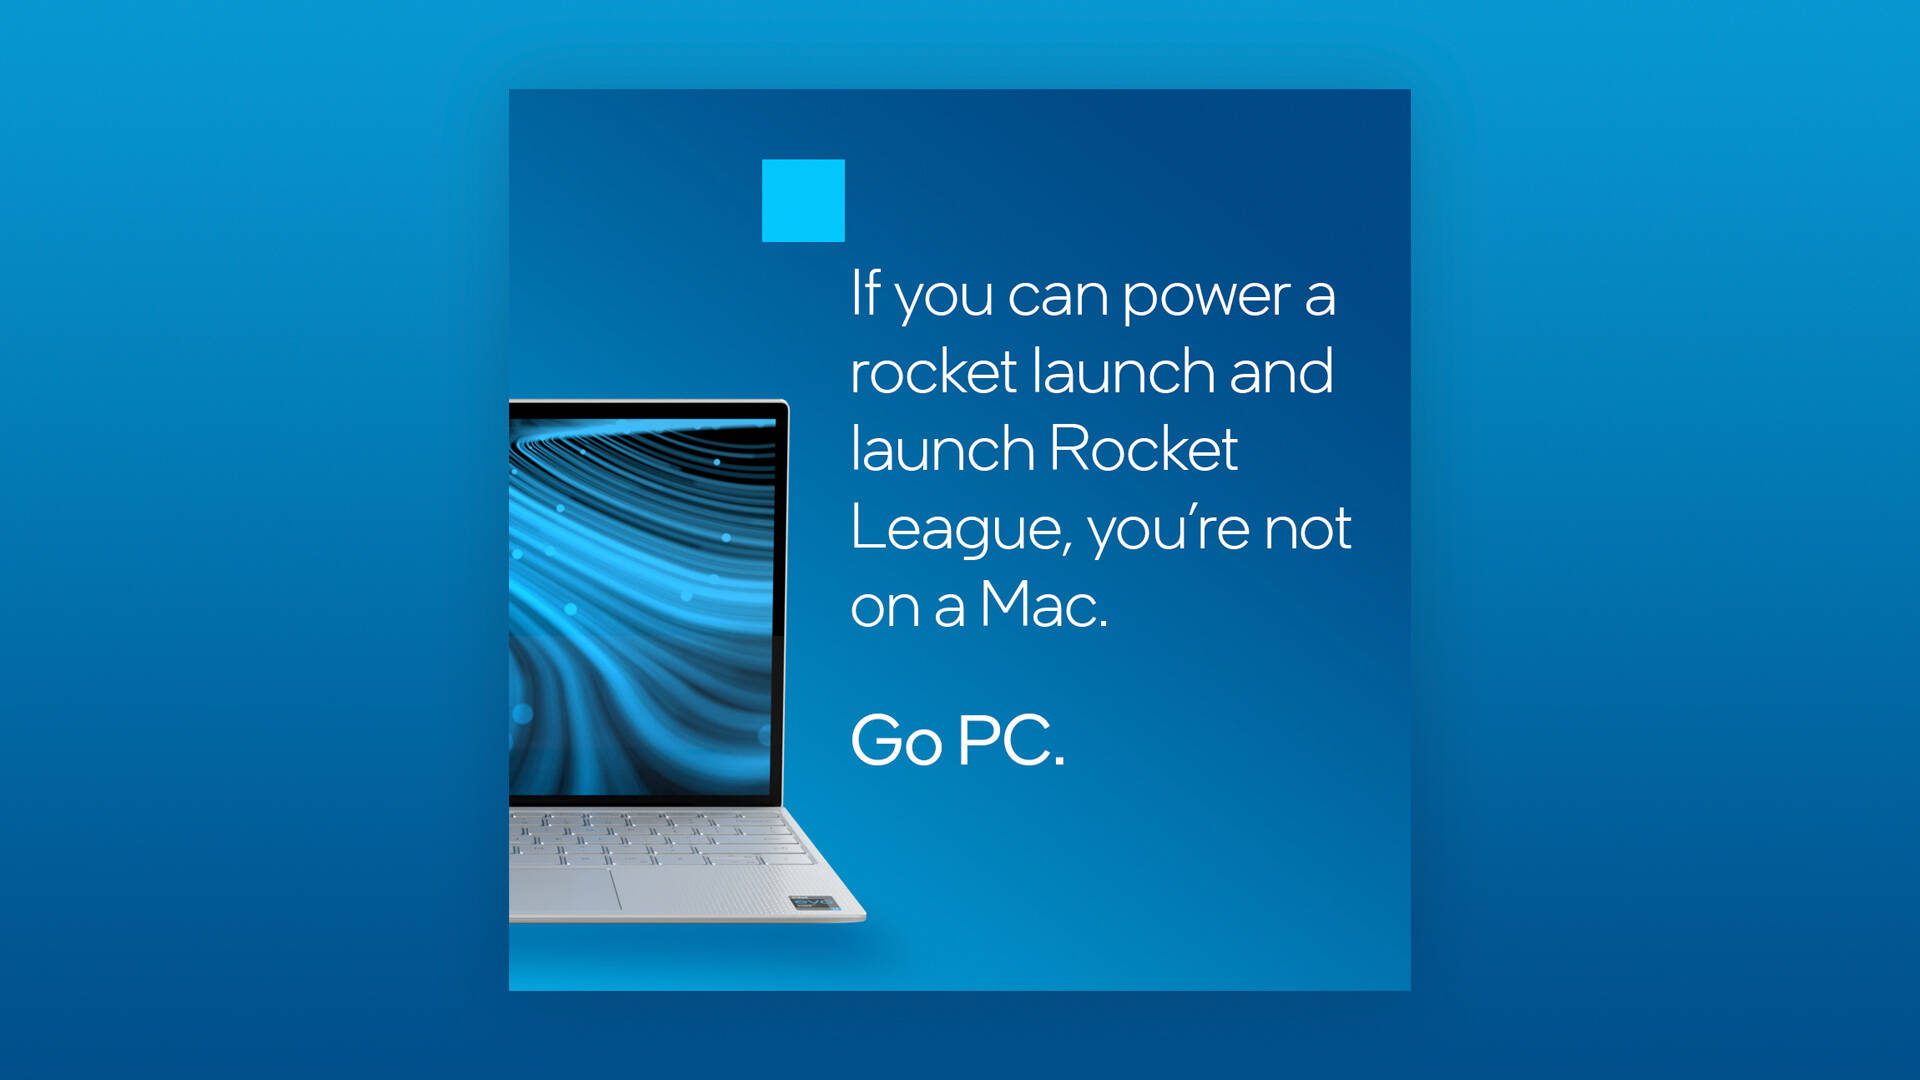 Intel campagna marketing contro Apple